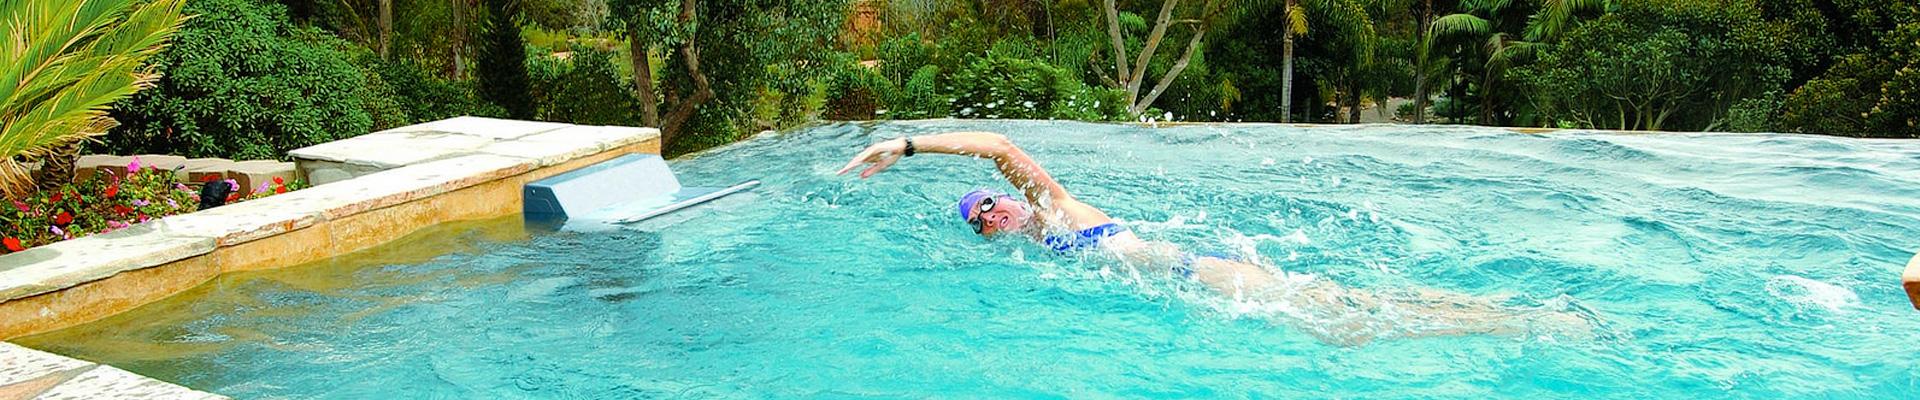 Maximize Your Pool with Fastlane, Swim Spa Dealer Dell Rapids